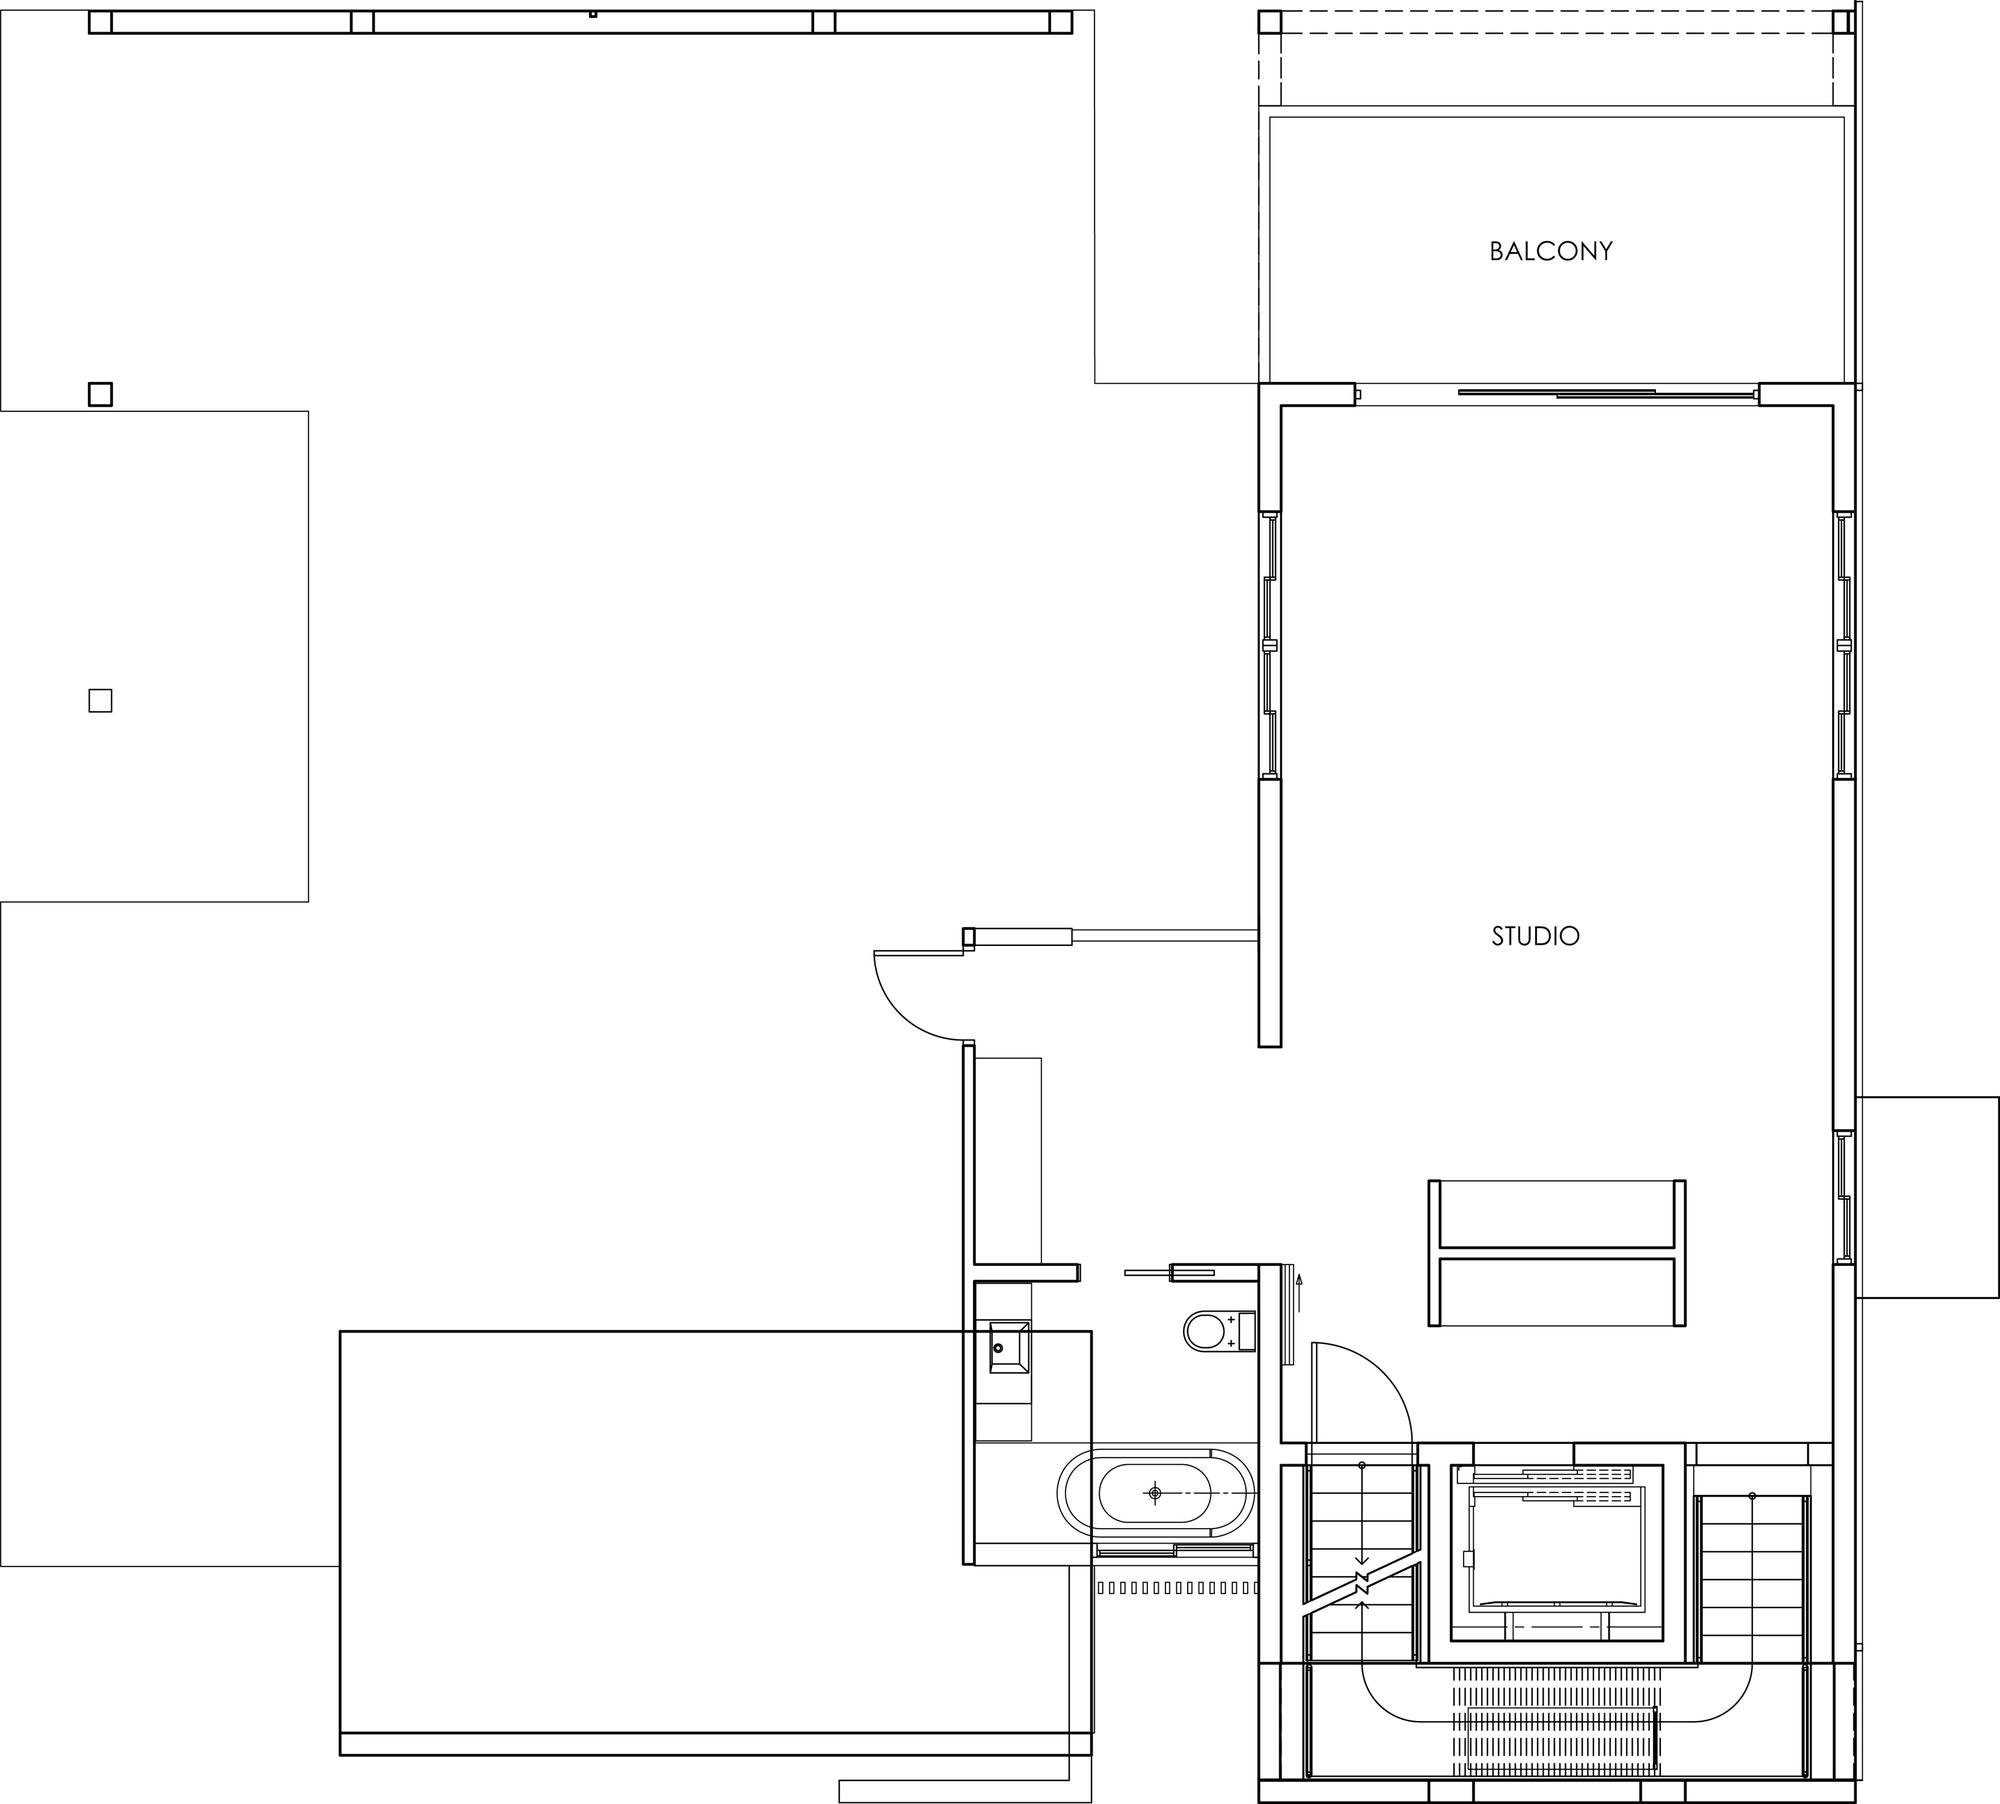 residencia-tavernier-drive-luis-pons-design-lab_101-house_renovation_-_tavernier_key_fl-_third_floor_plan